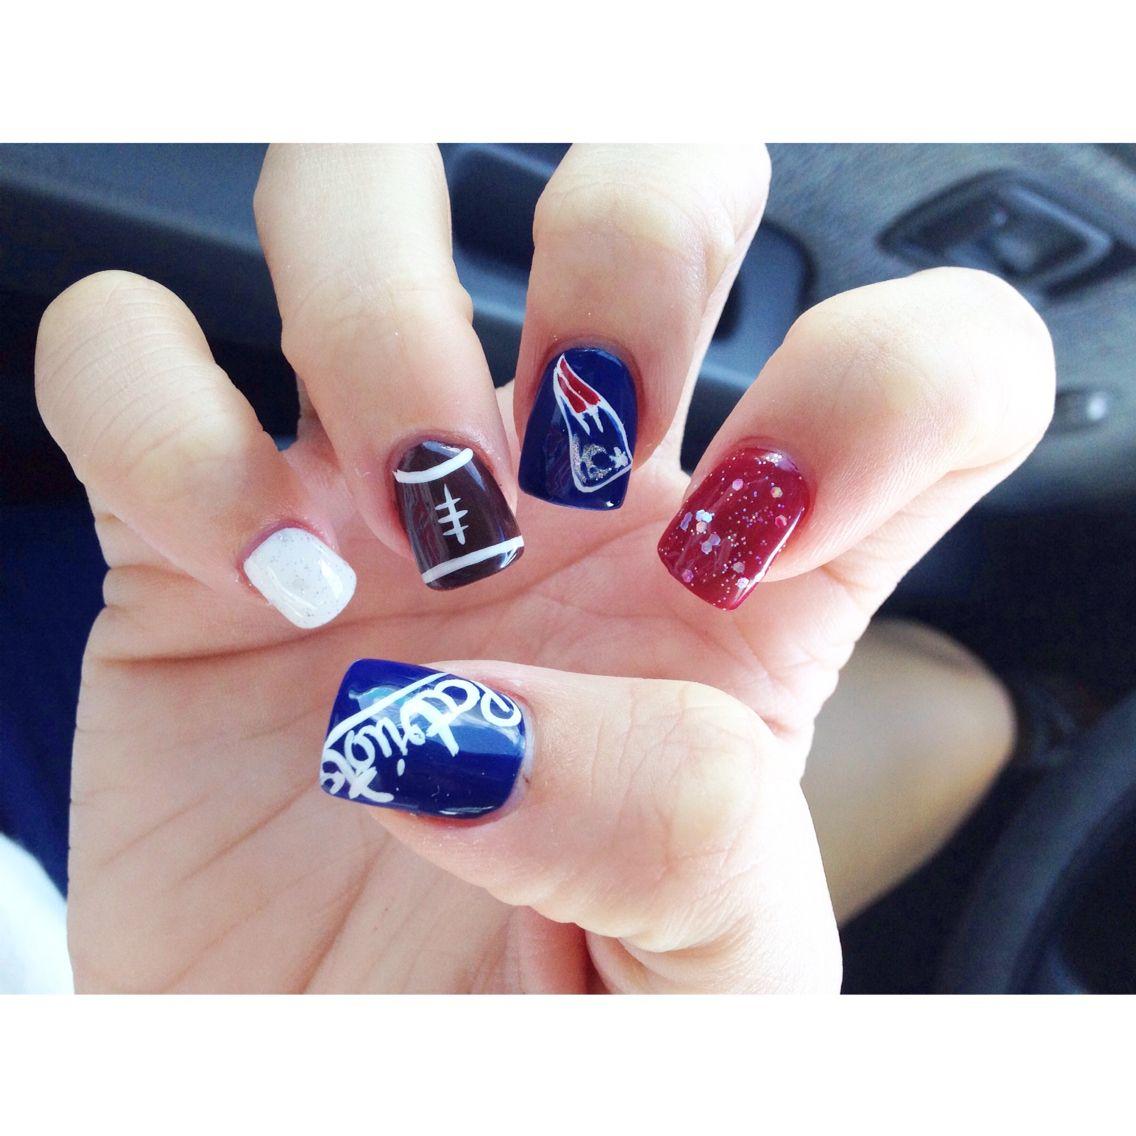 New England Patriots nails #nflnails #footballseason #patriotsnation ...